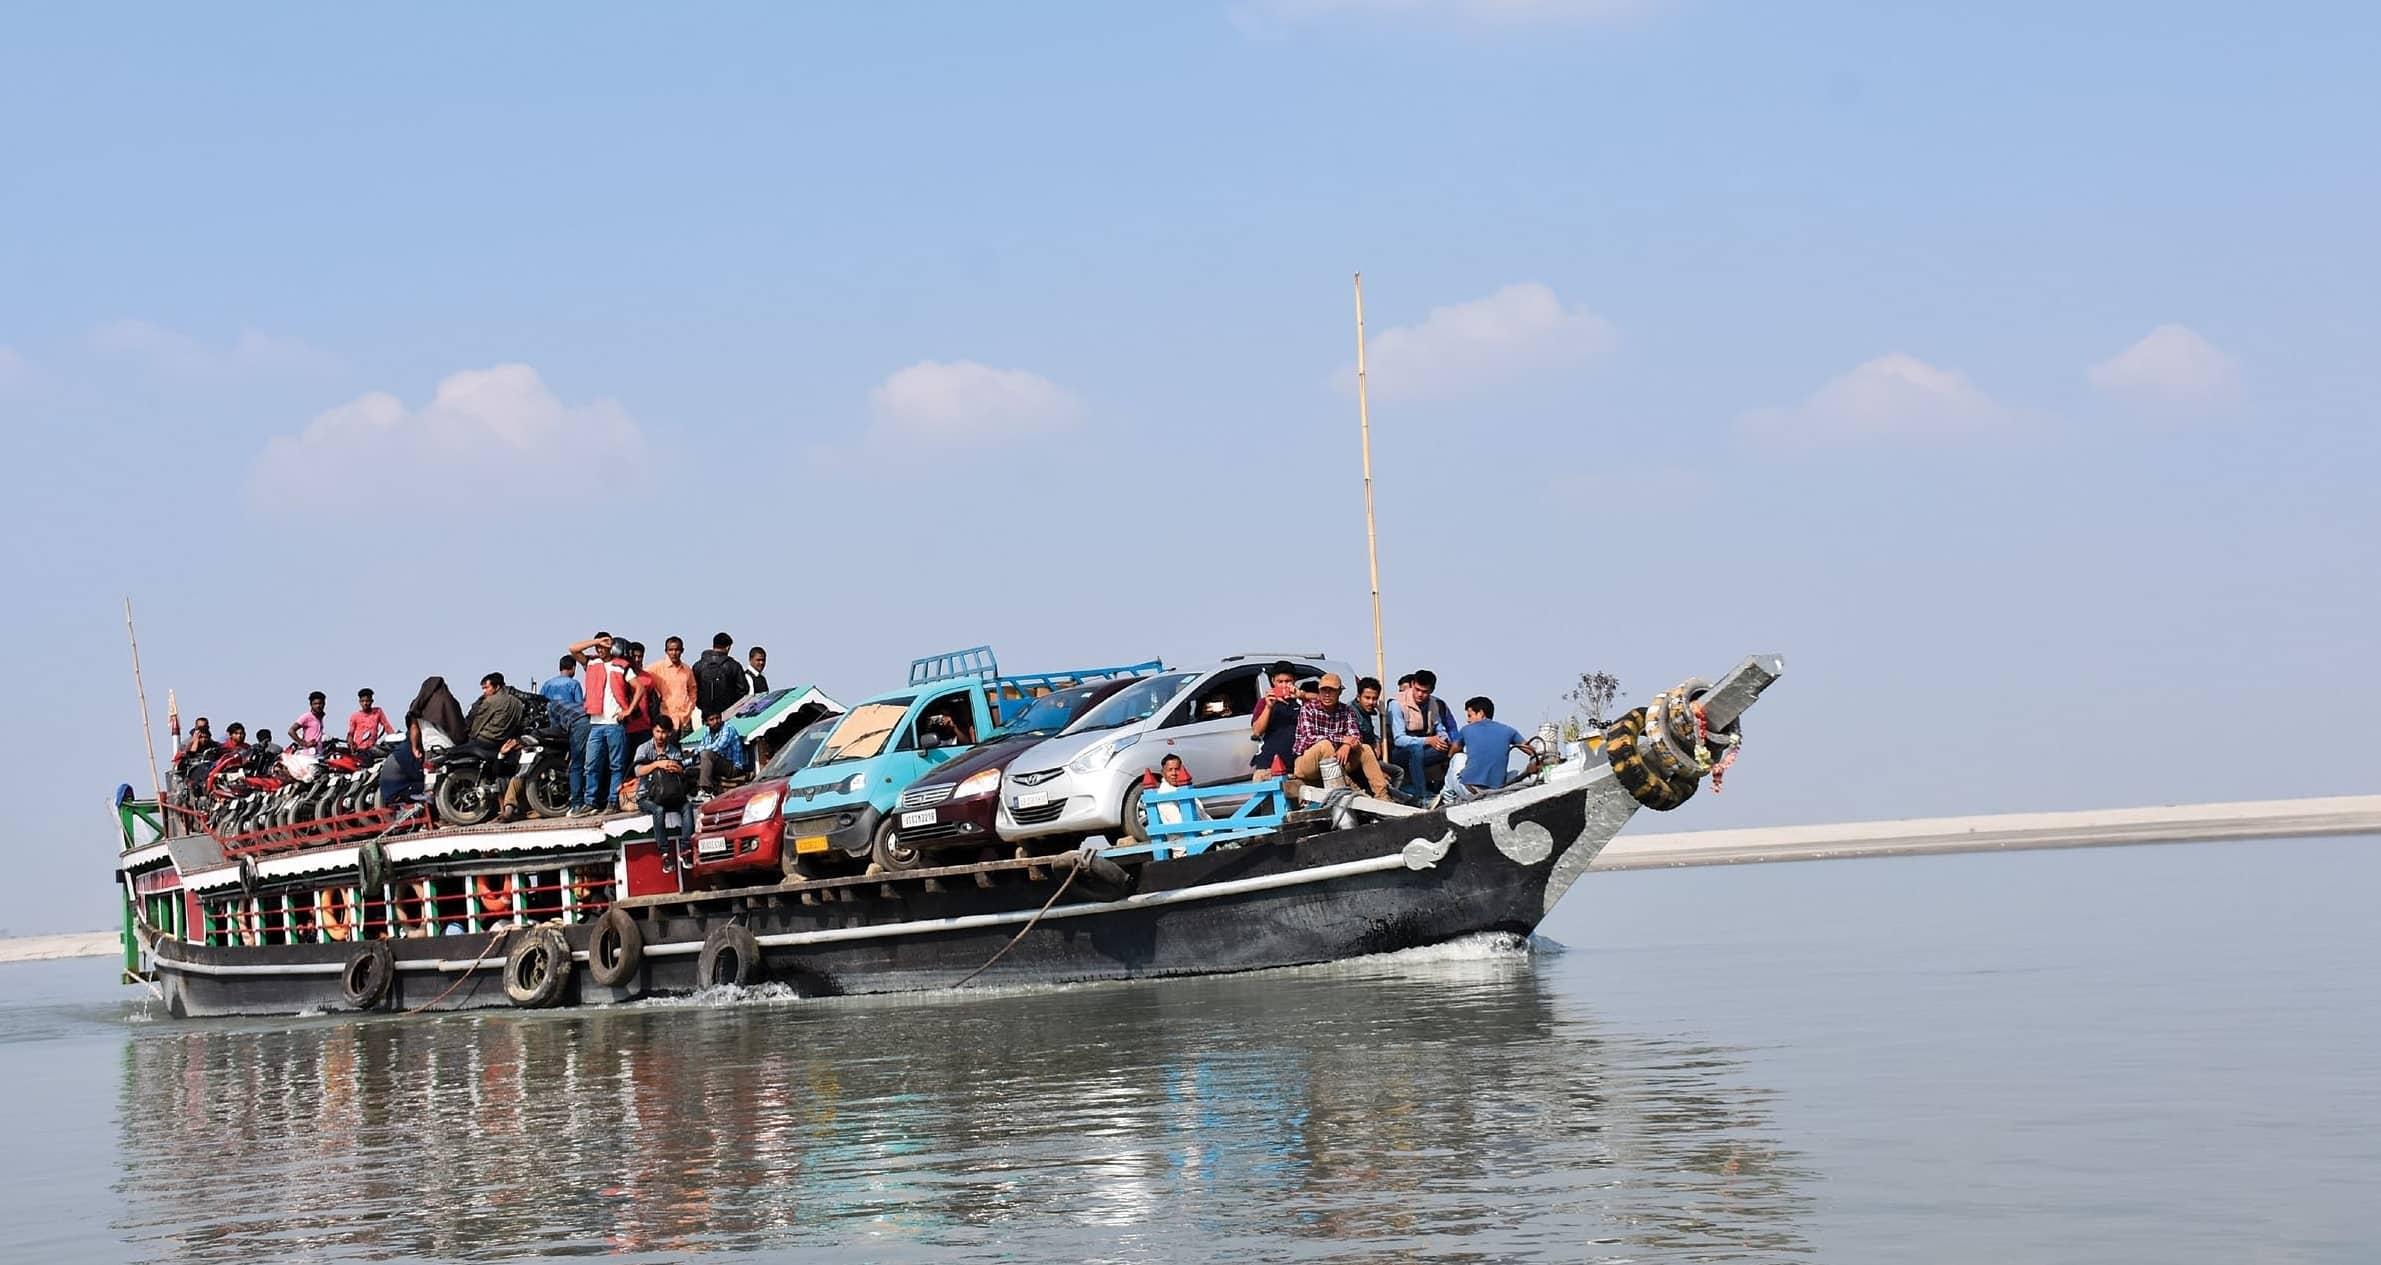 Assam - The Islanders Of Majuli